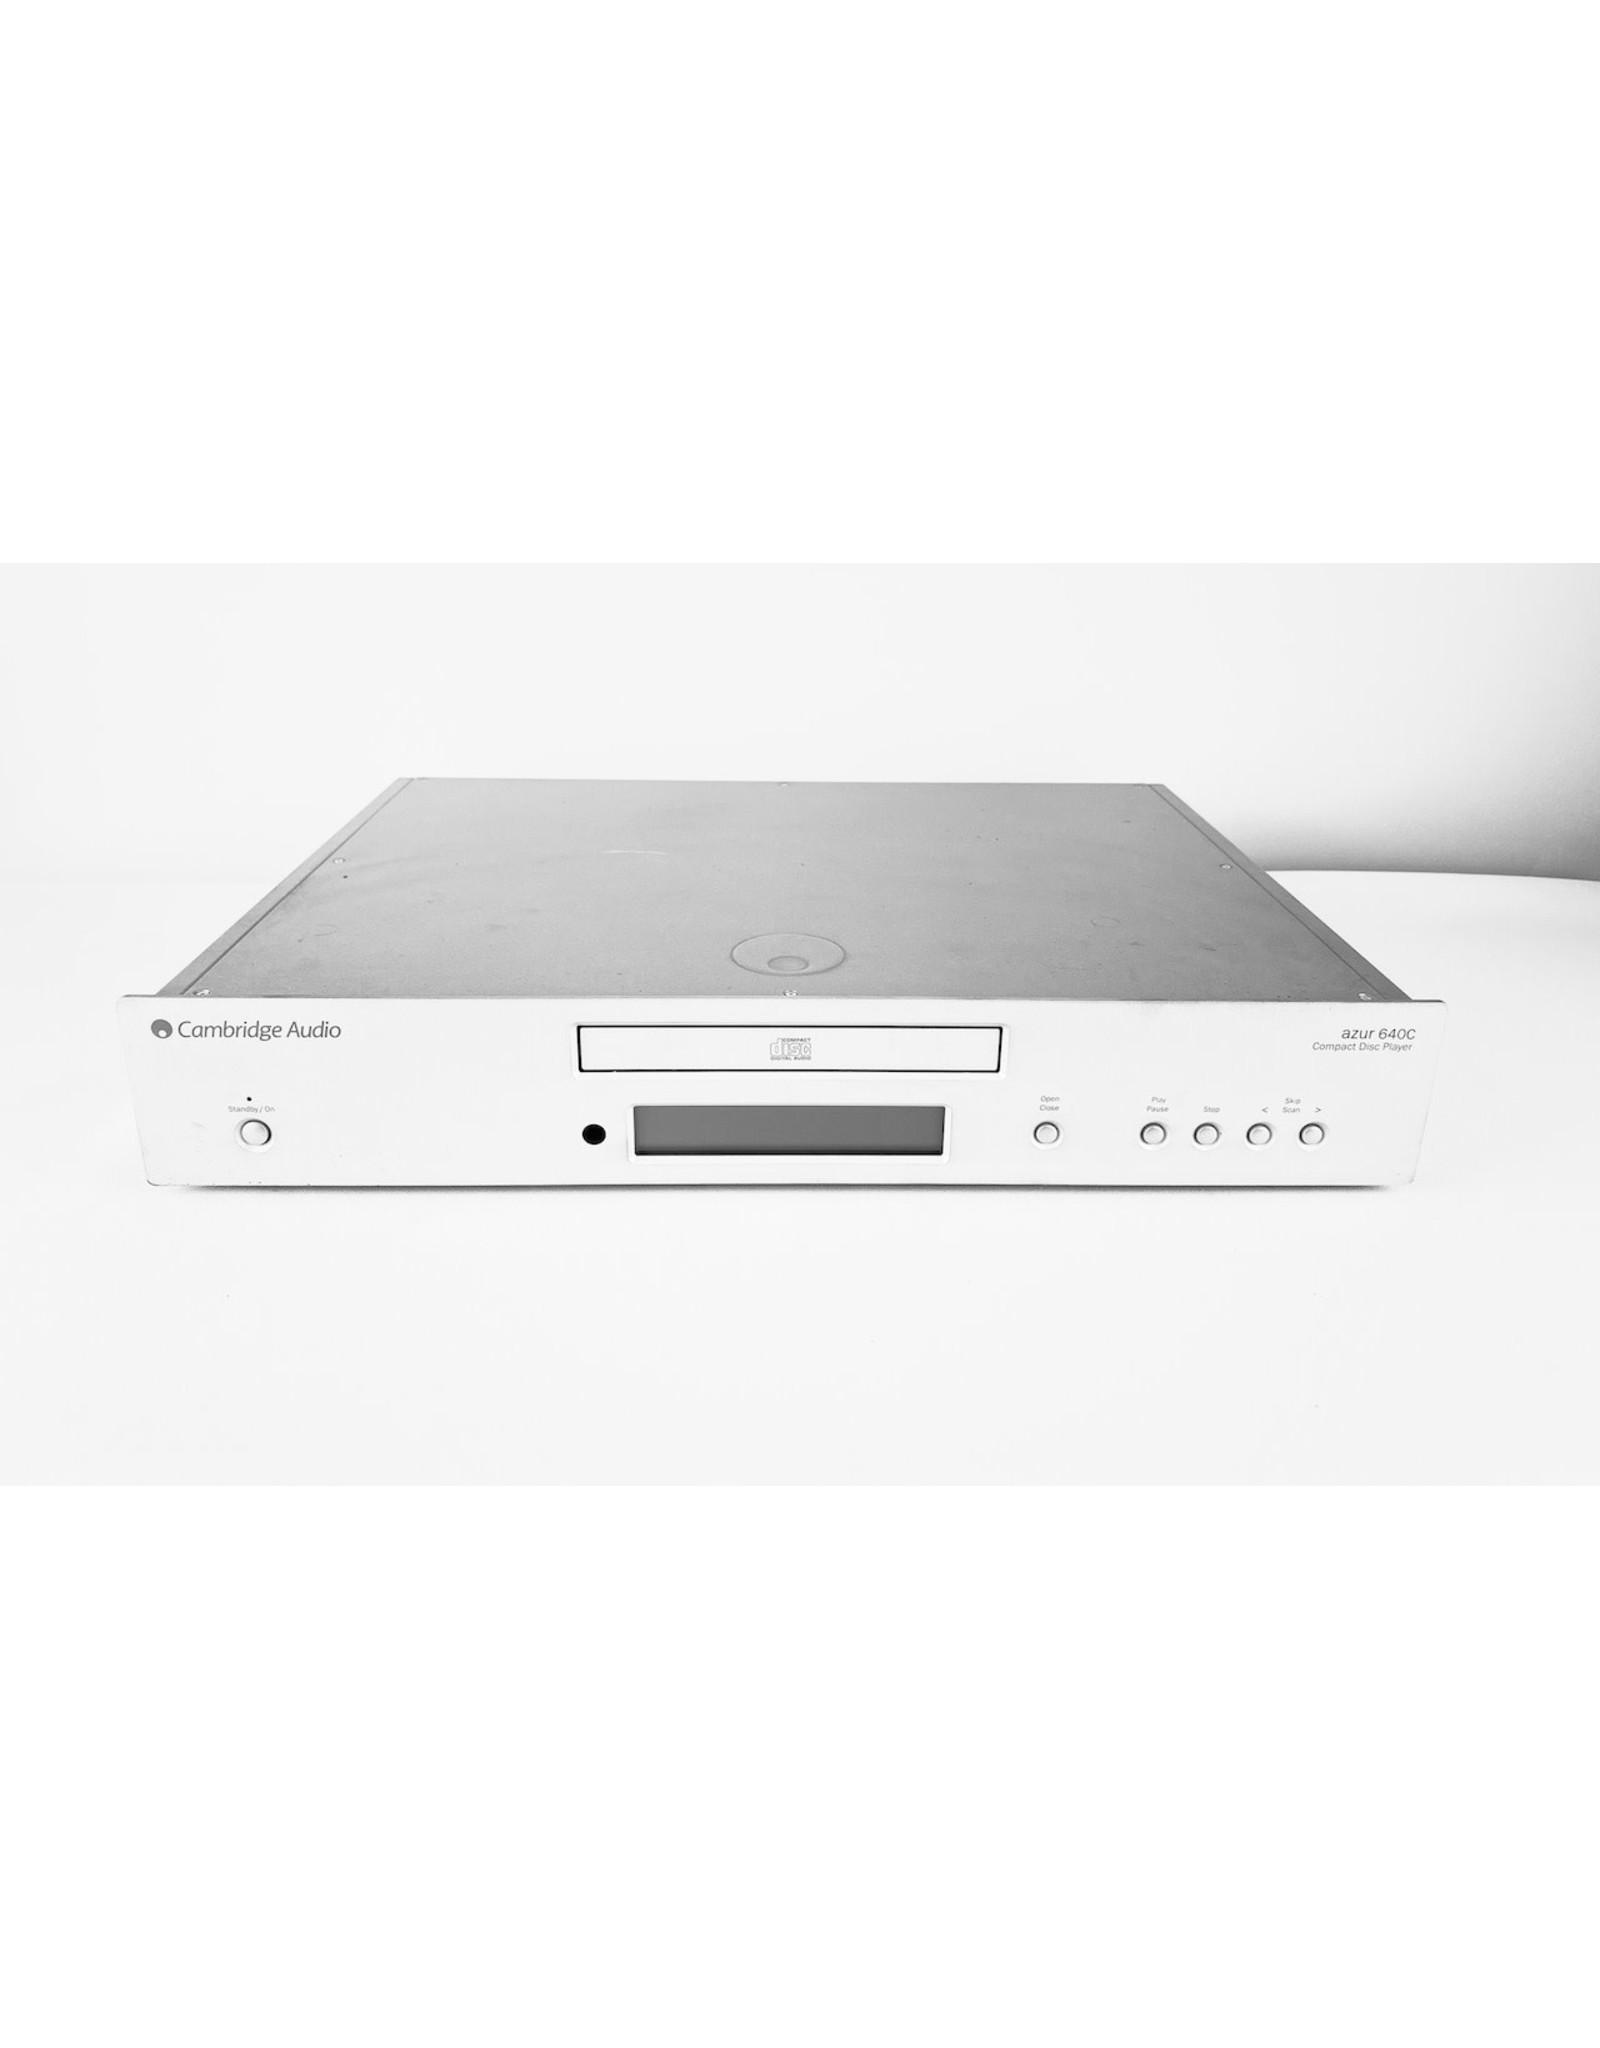 Cambridge Audio Cambridge Audio 640C v2 Silver CD Player USED